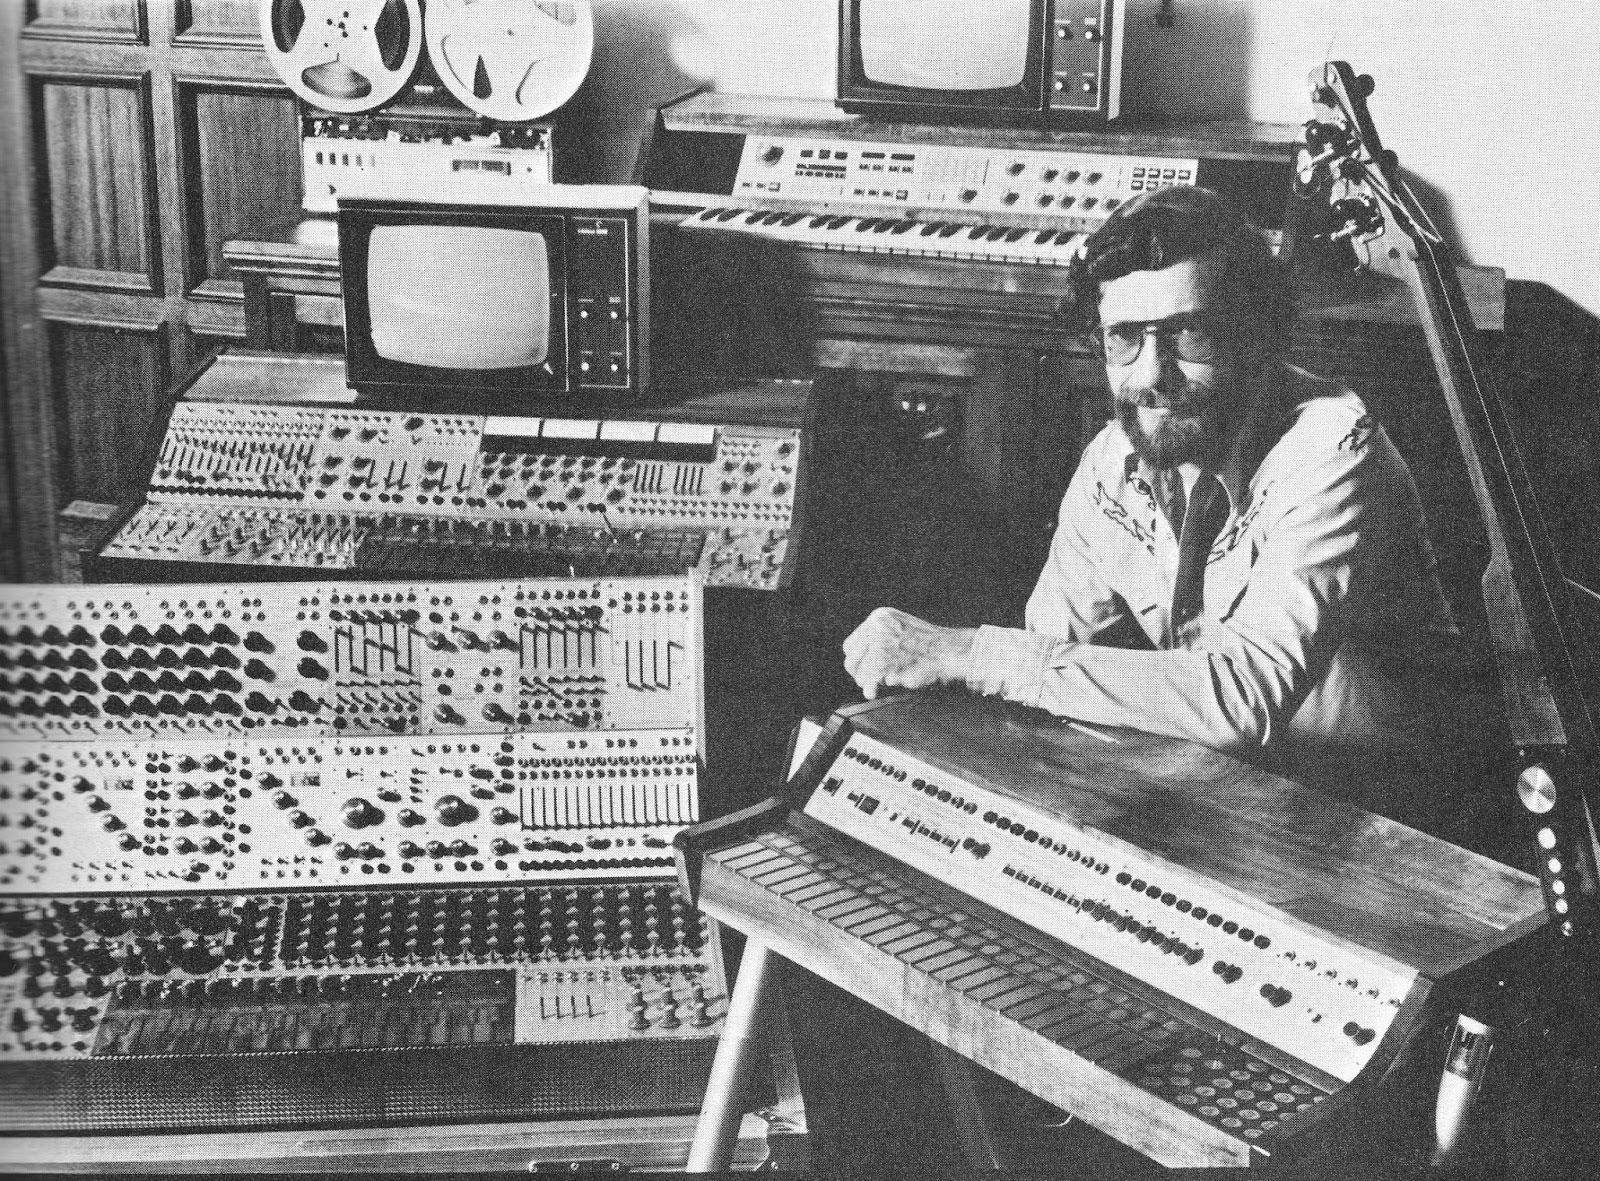 electronic music pioneer robert